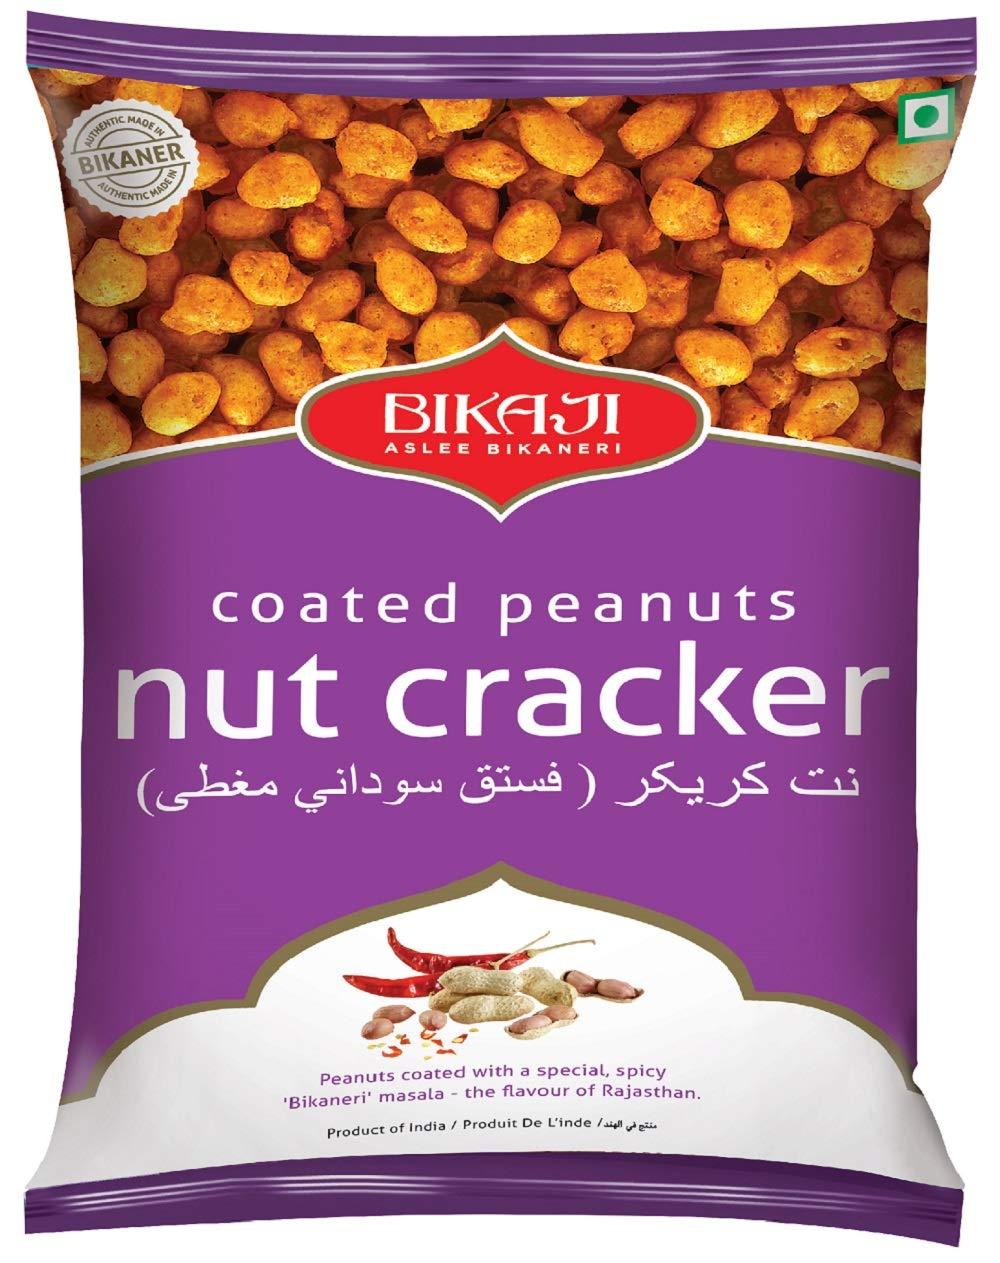 Bikaji Aslee Bikaneri Spicy Coated Peanuts Nut Cracker -Indian Namkeen Snack 400 g